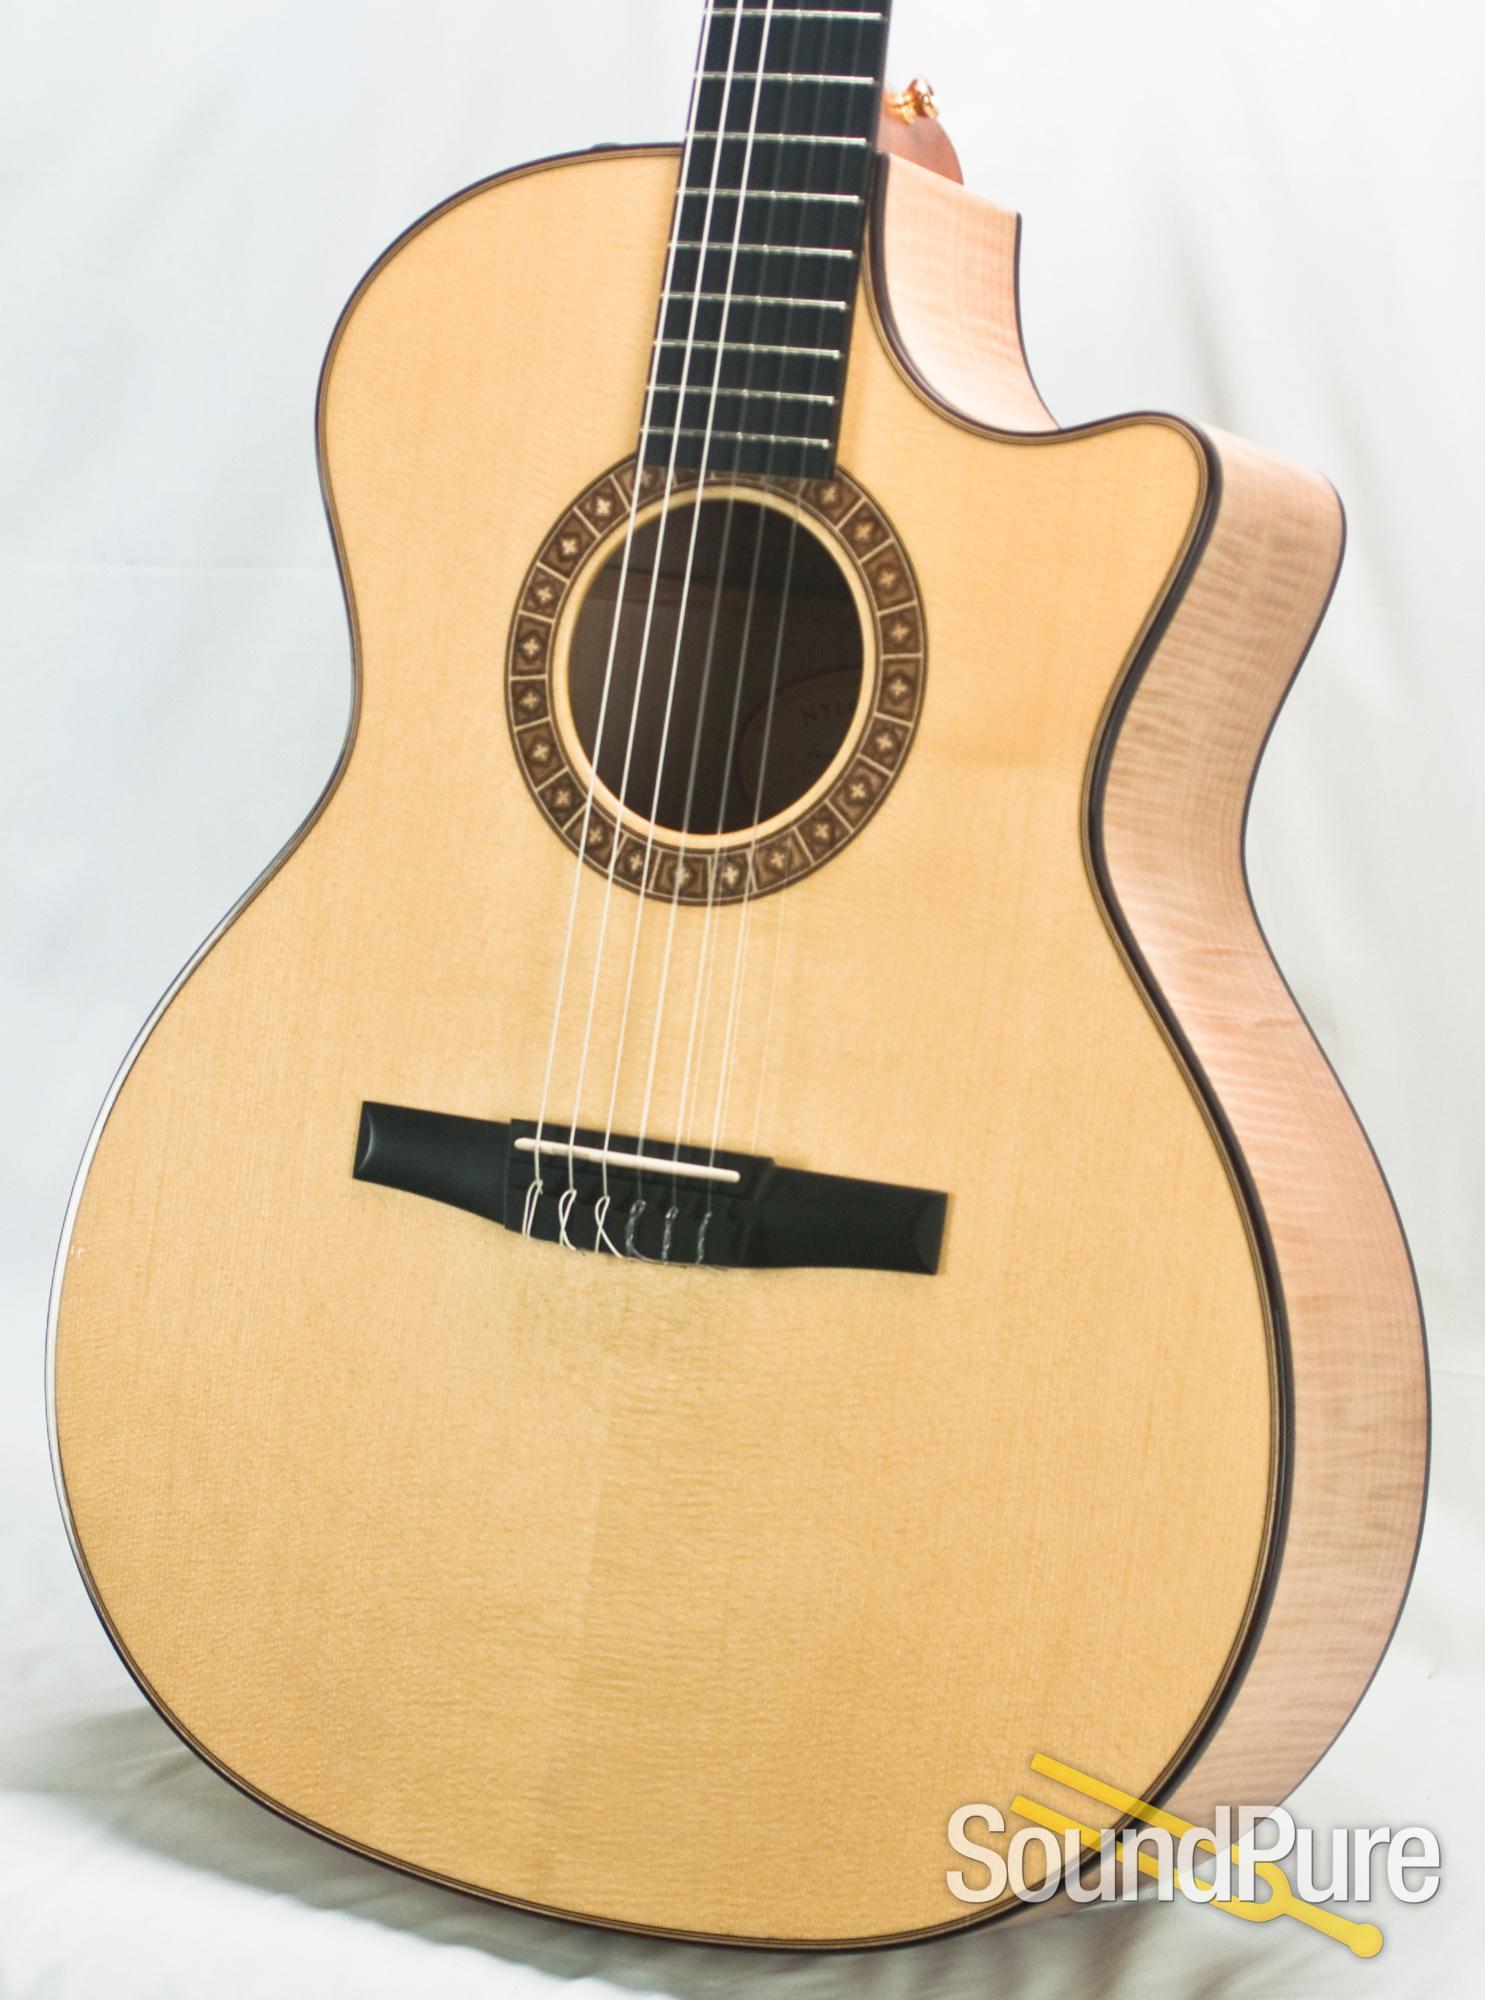 taylor ns64ce nylon string acoustic guitar used ebay. Black Bedroom Furniture Sets. Home Design Ideas